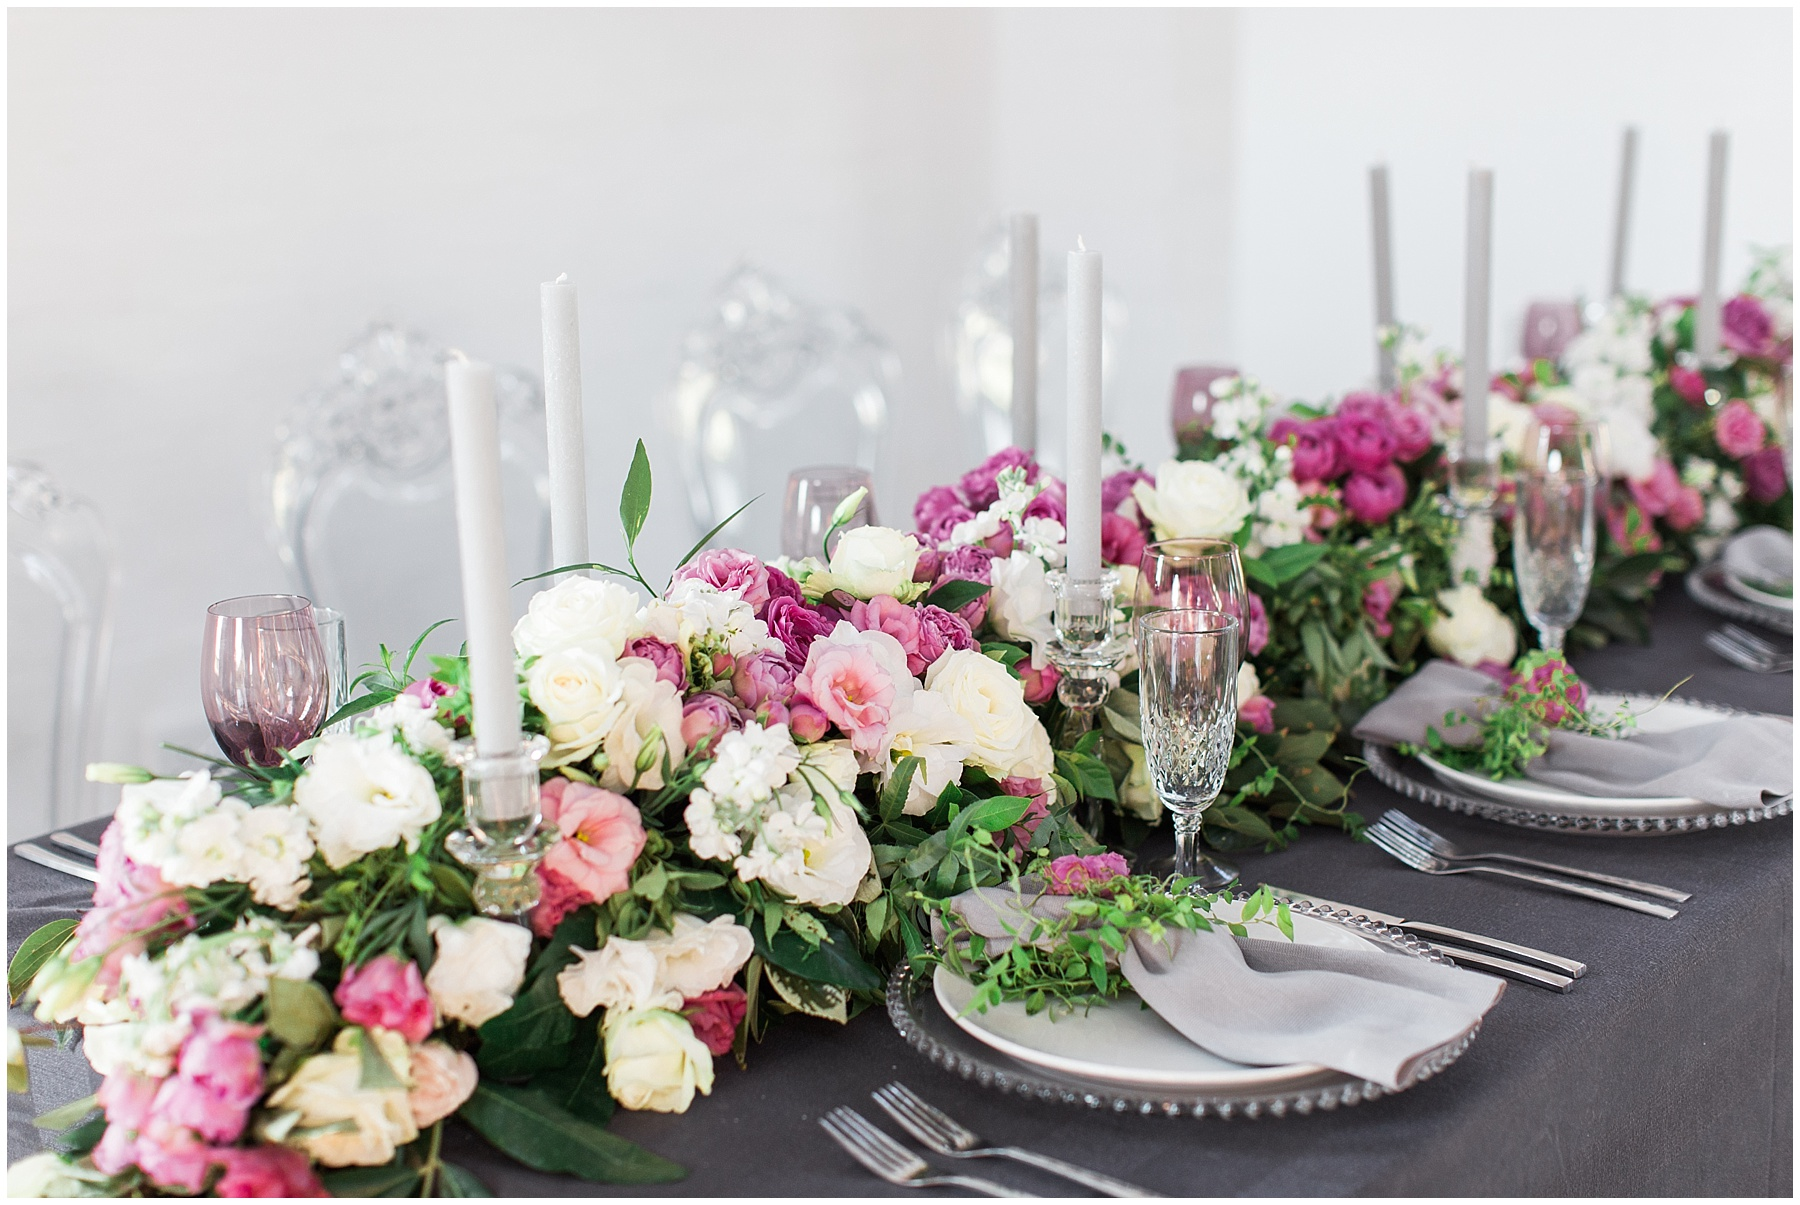 AliciaLandman_JoleneandZander_Wedding_The Pretty Blog_0408.jpg